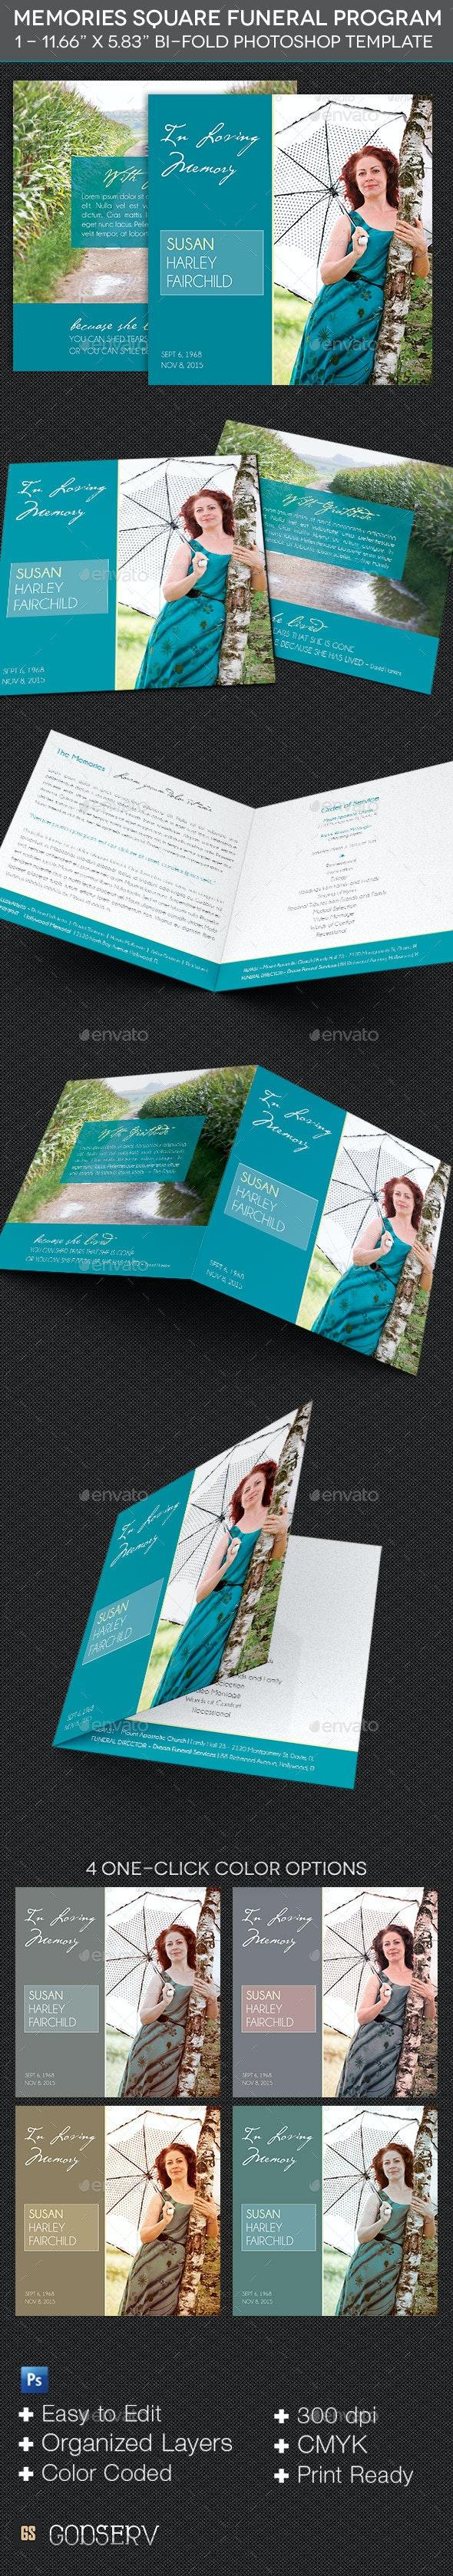 Memories Square Funeral Program Template - Informational Brochures